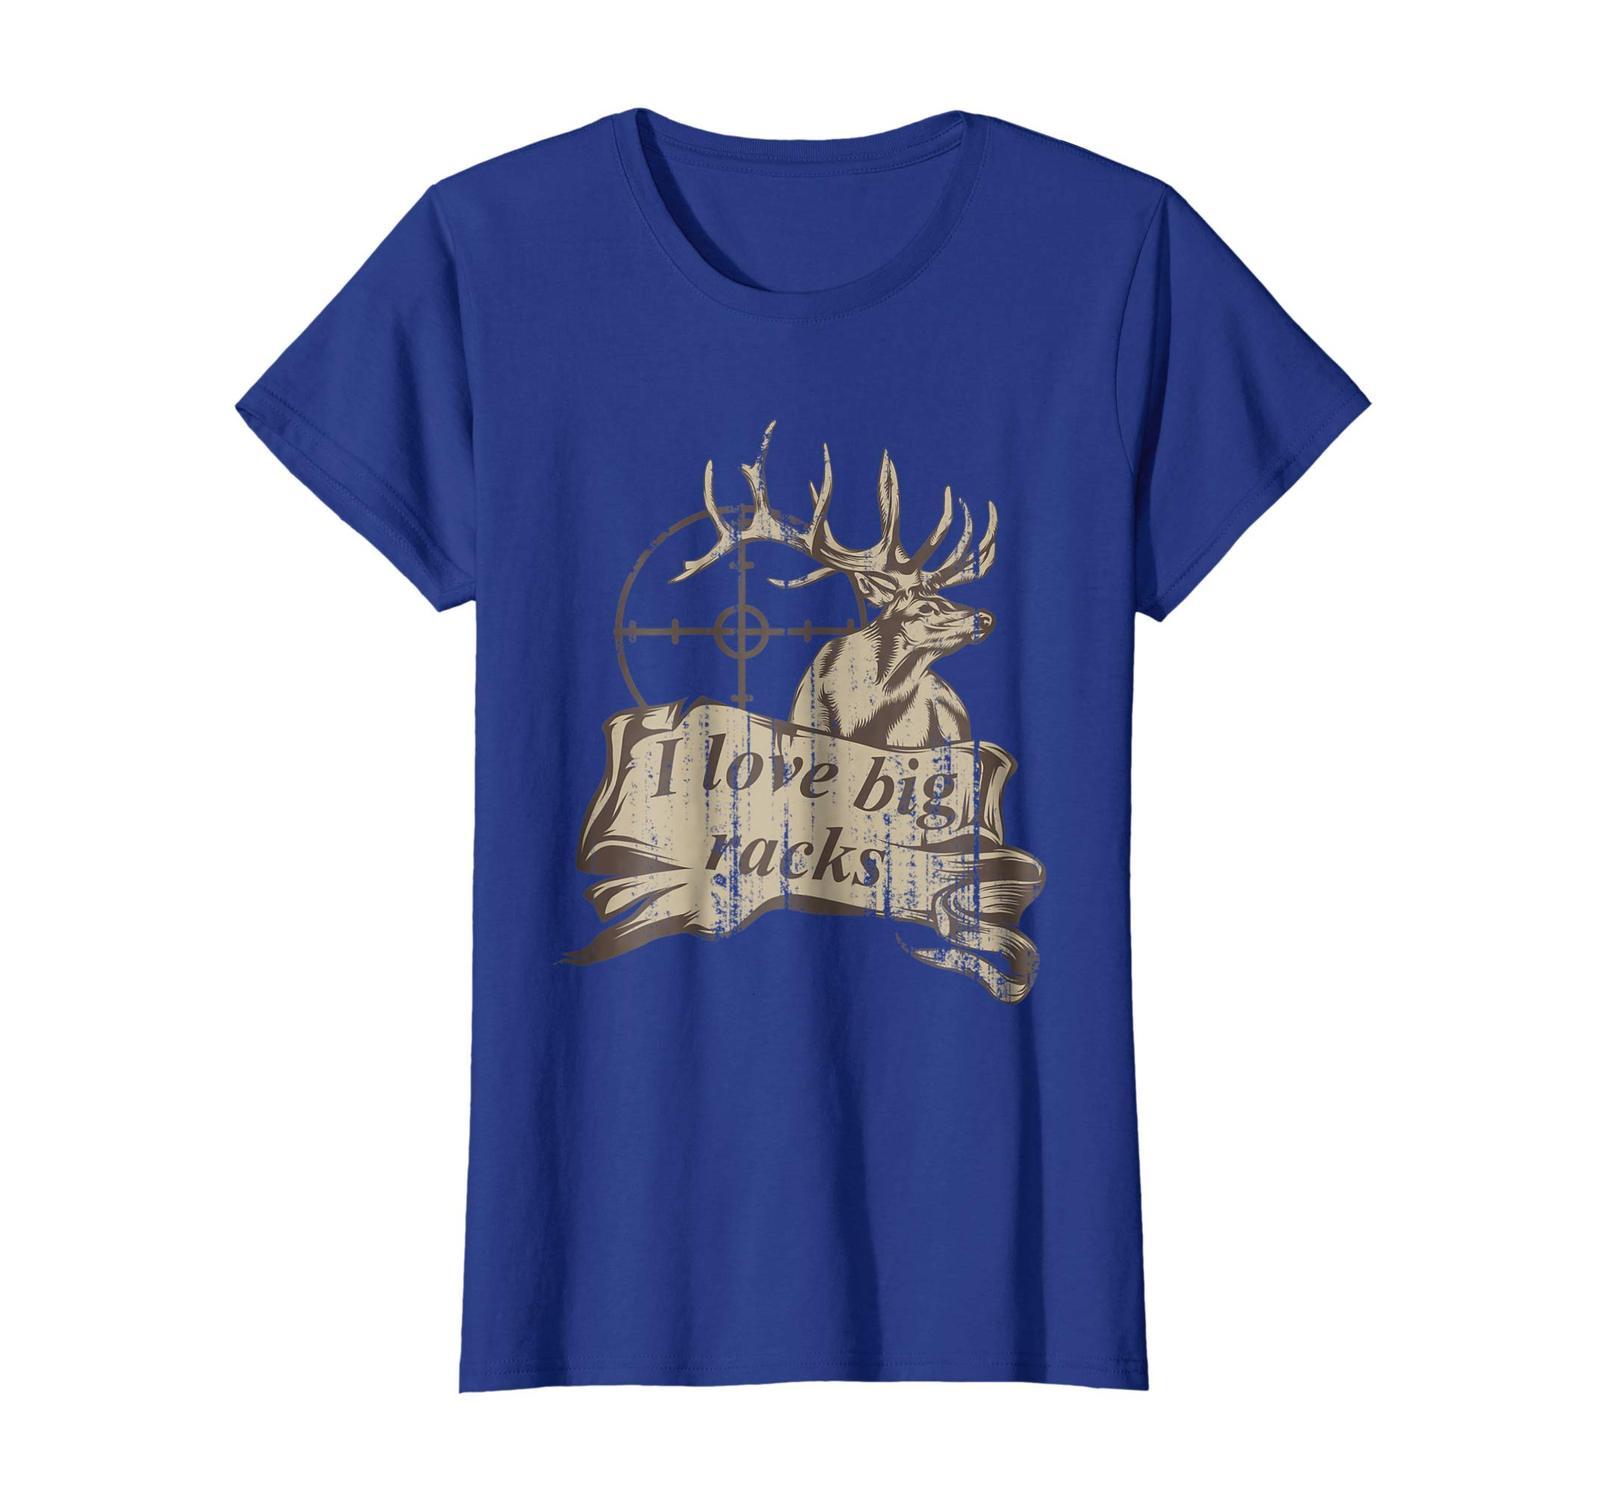 Brother Shirts - I Love Big Racks Shirt For Men/Women Who Are Deer Hunters Wowen